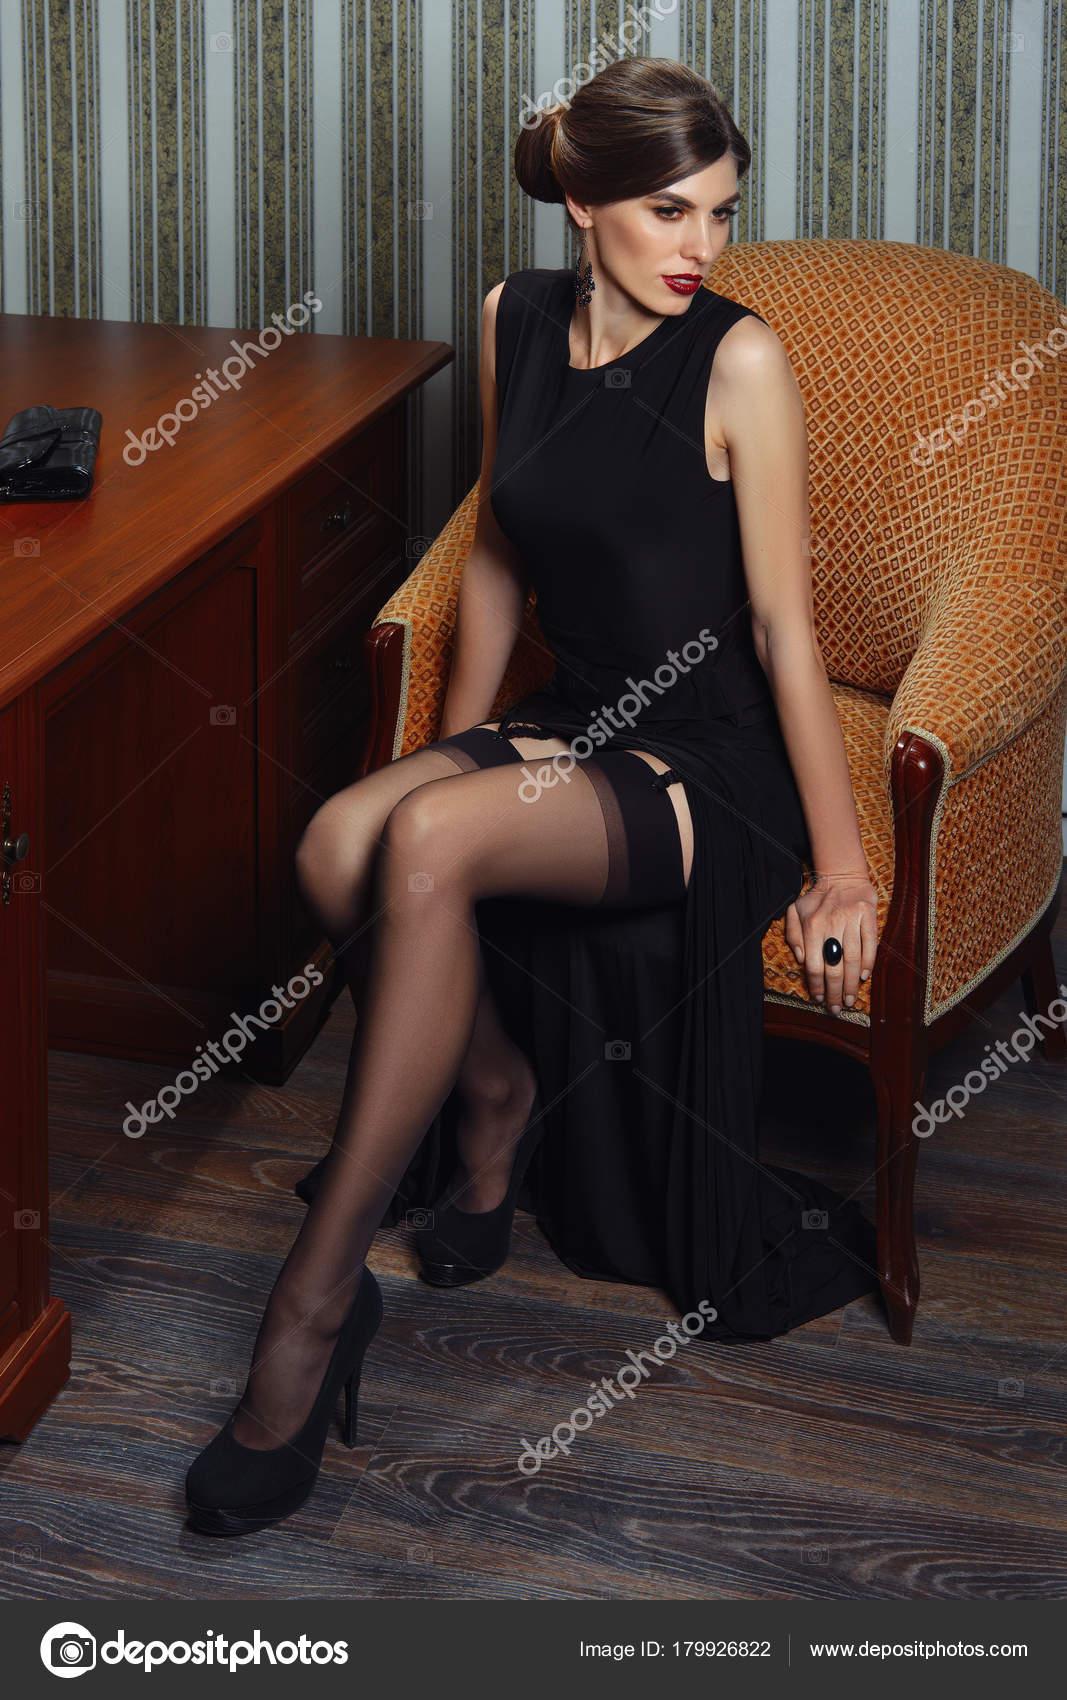 Stocking lady pics